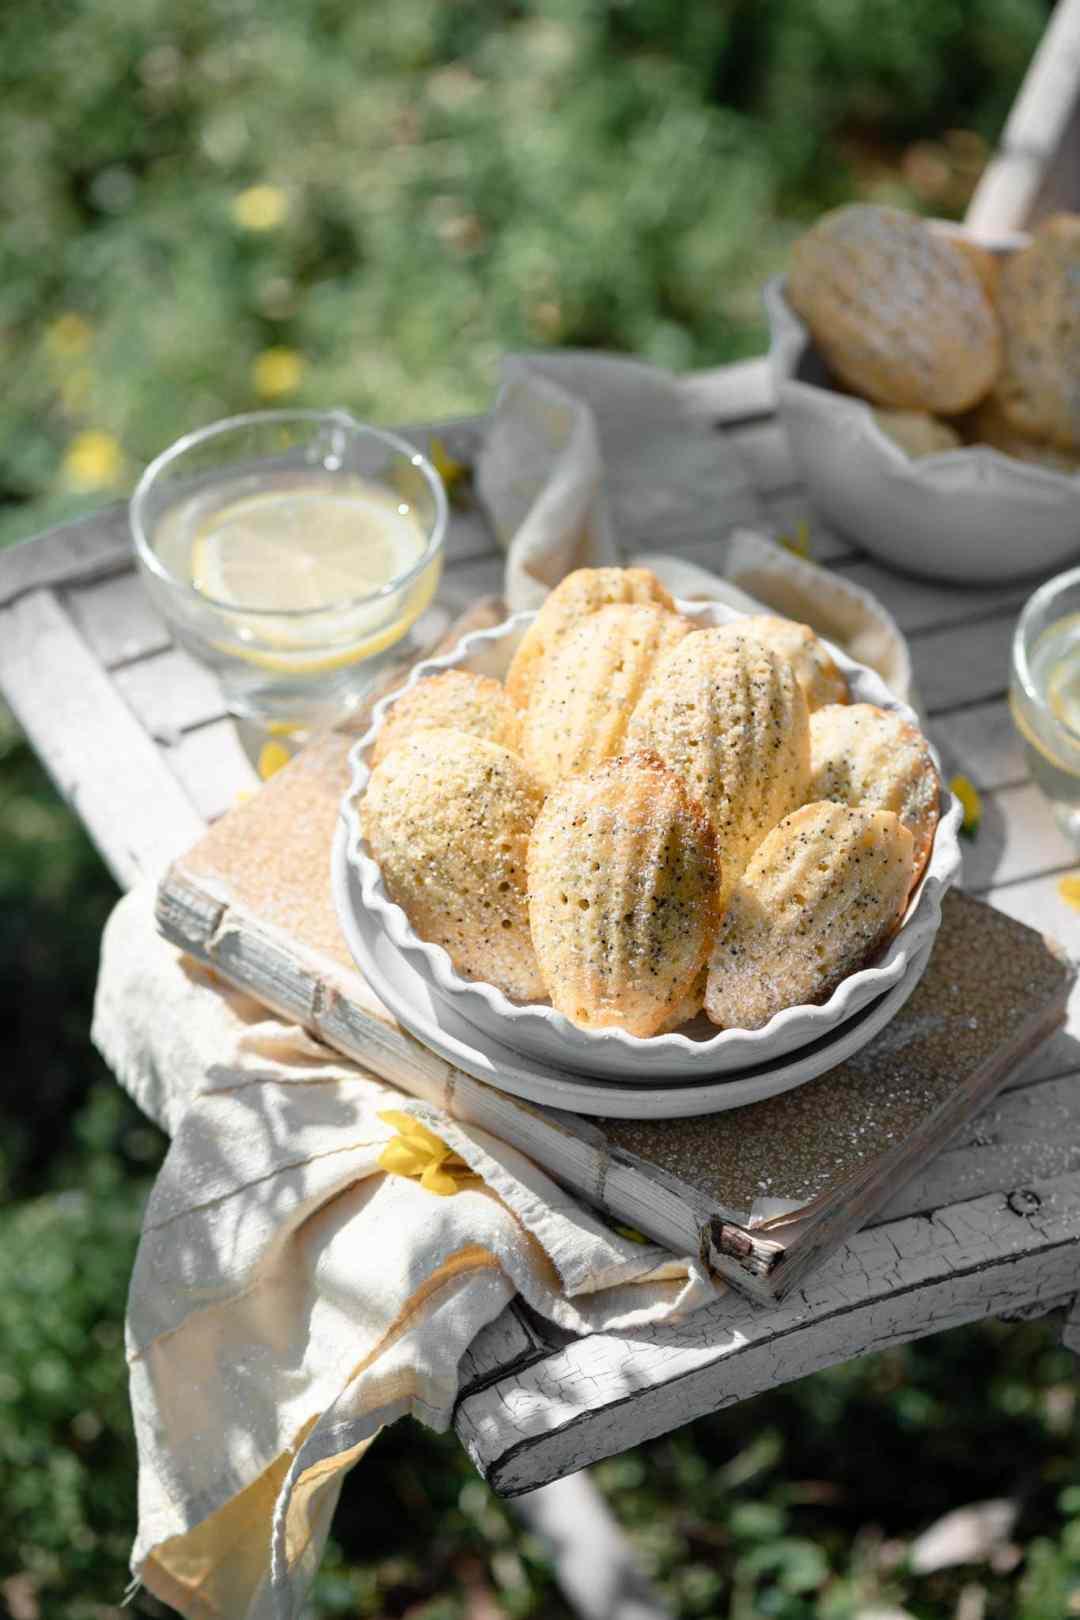 Lemon Poppyseed French Madeleines Recipe served with lemonade.